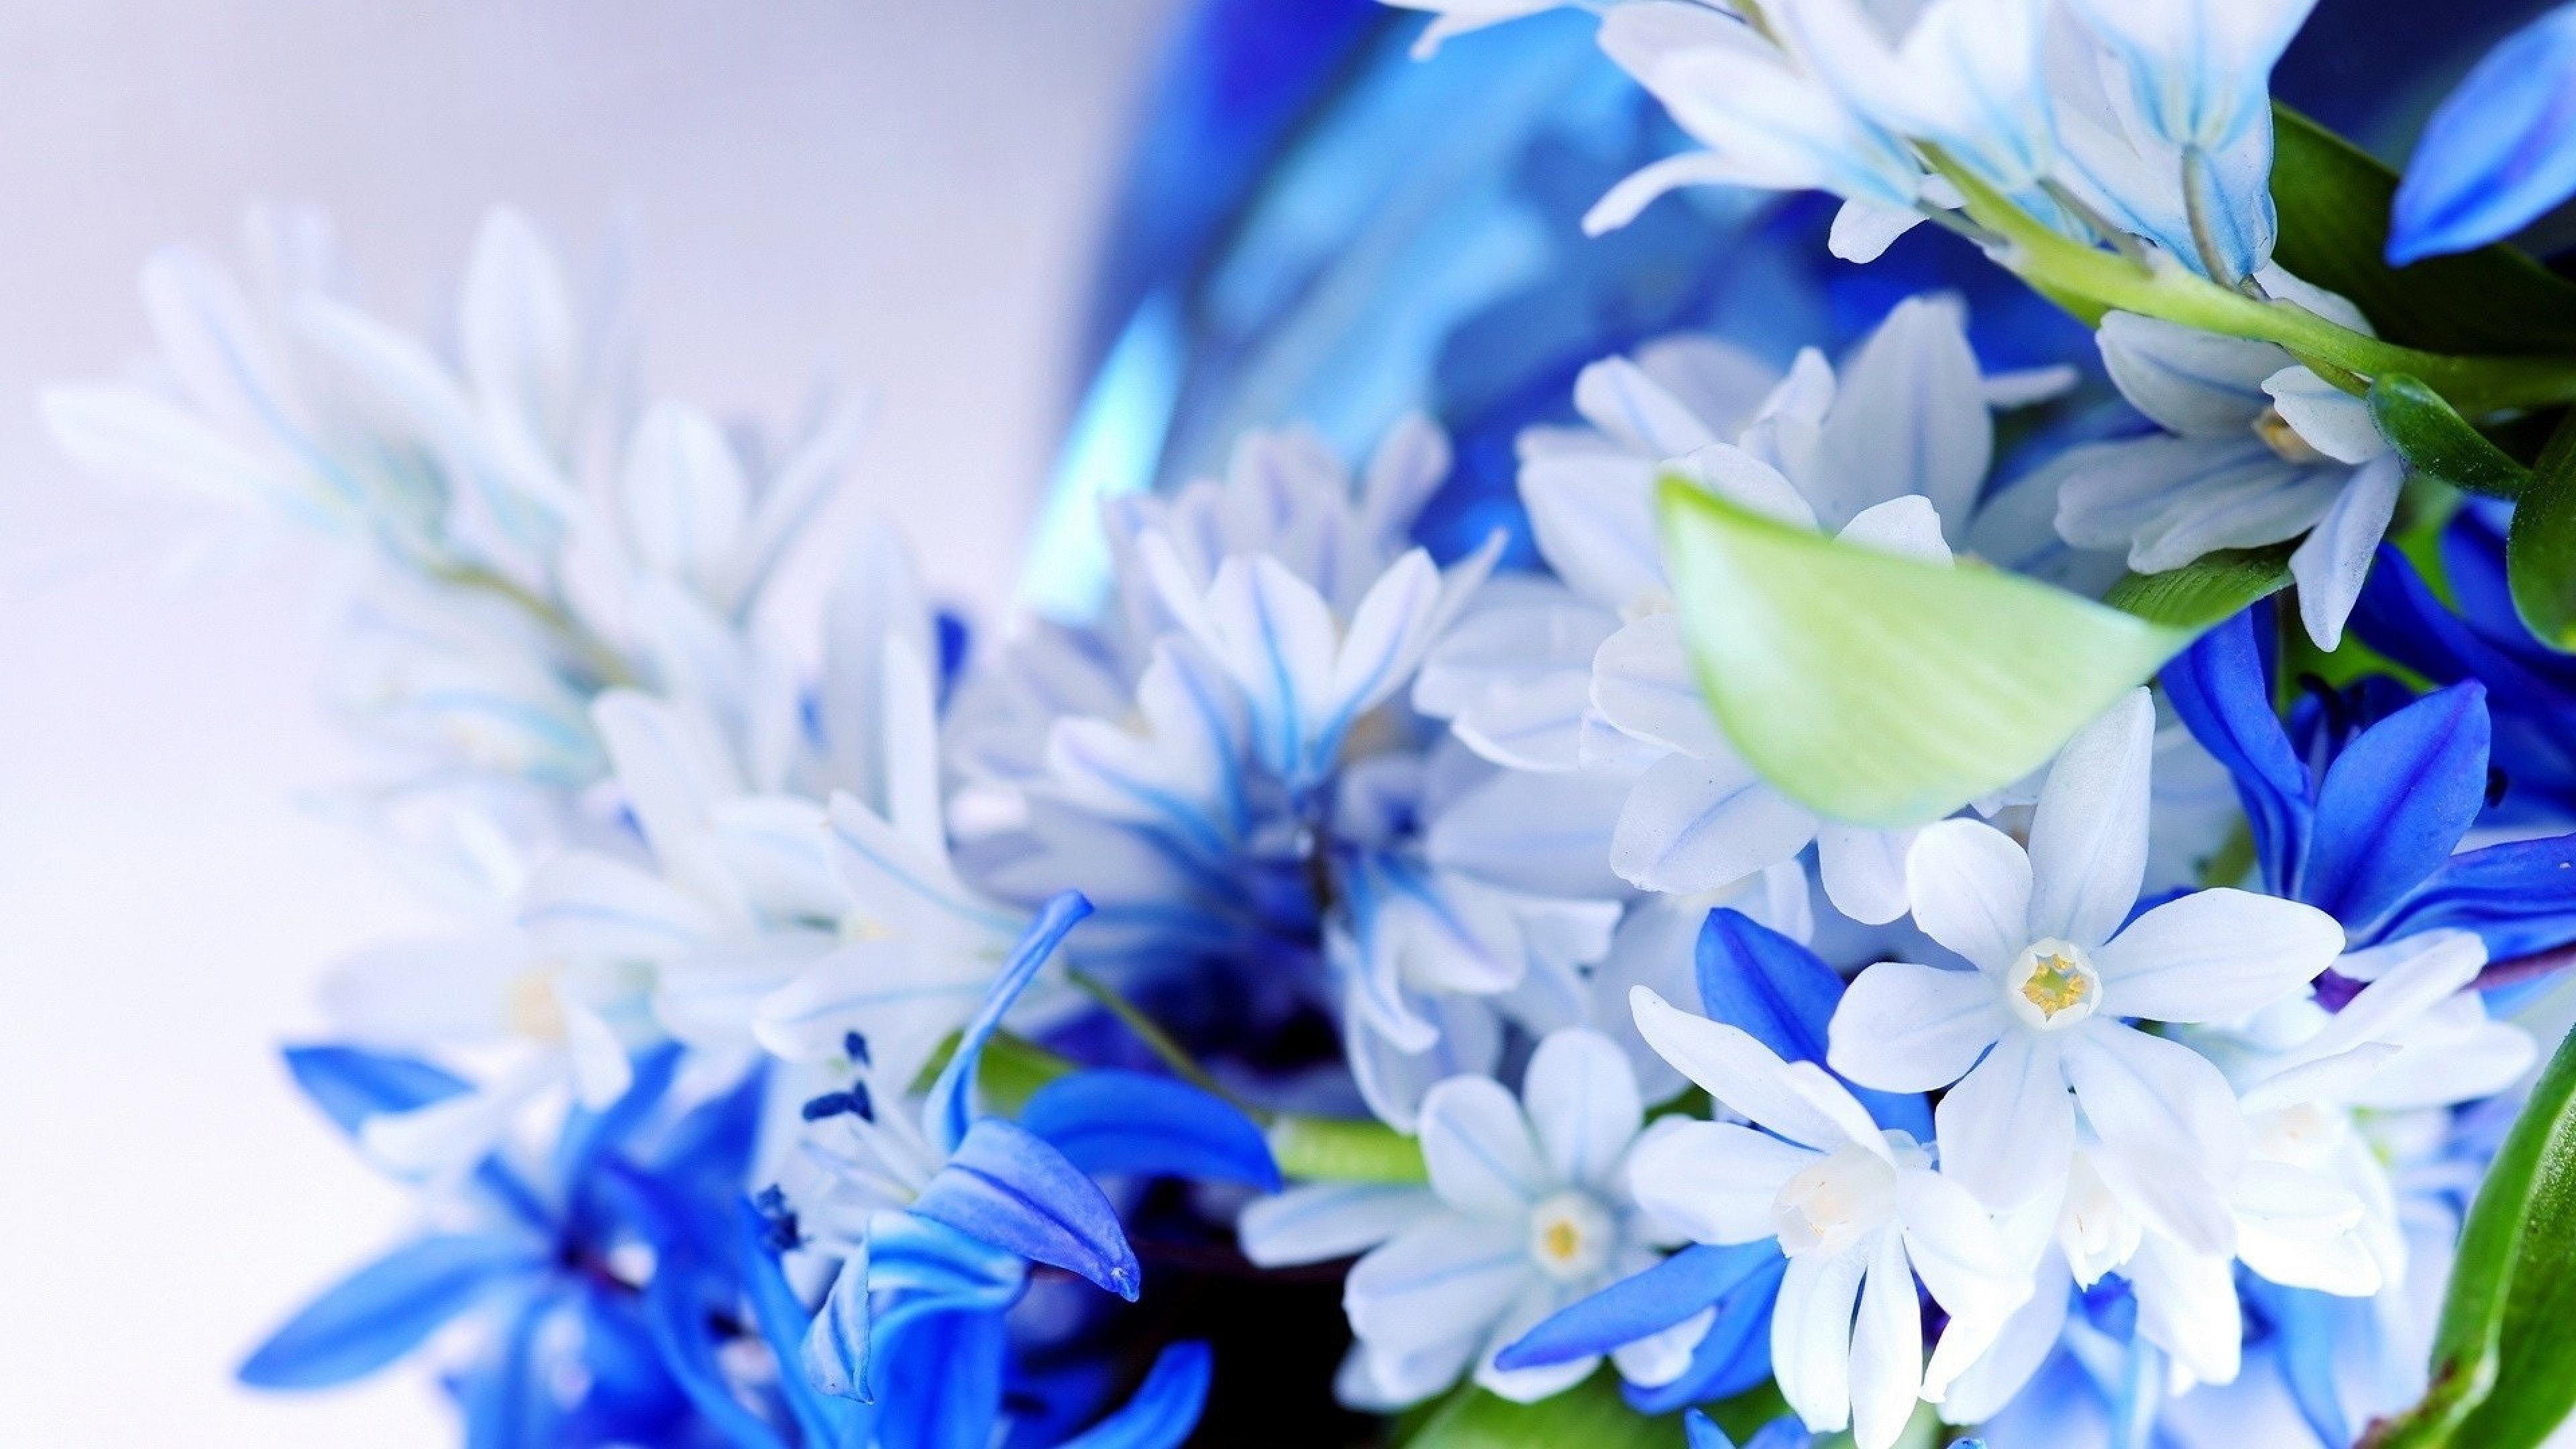 Flowers 4k Wallpapers - Wallpaper Cave